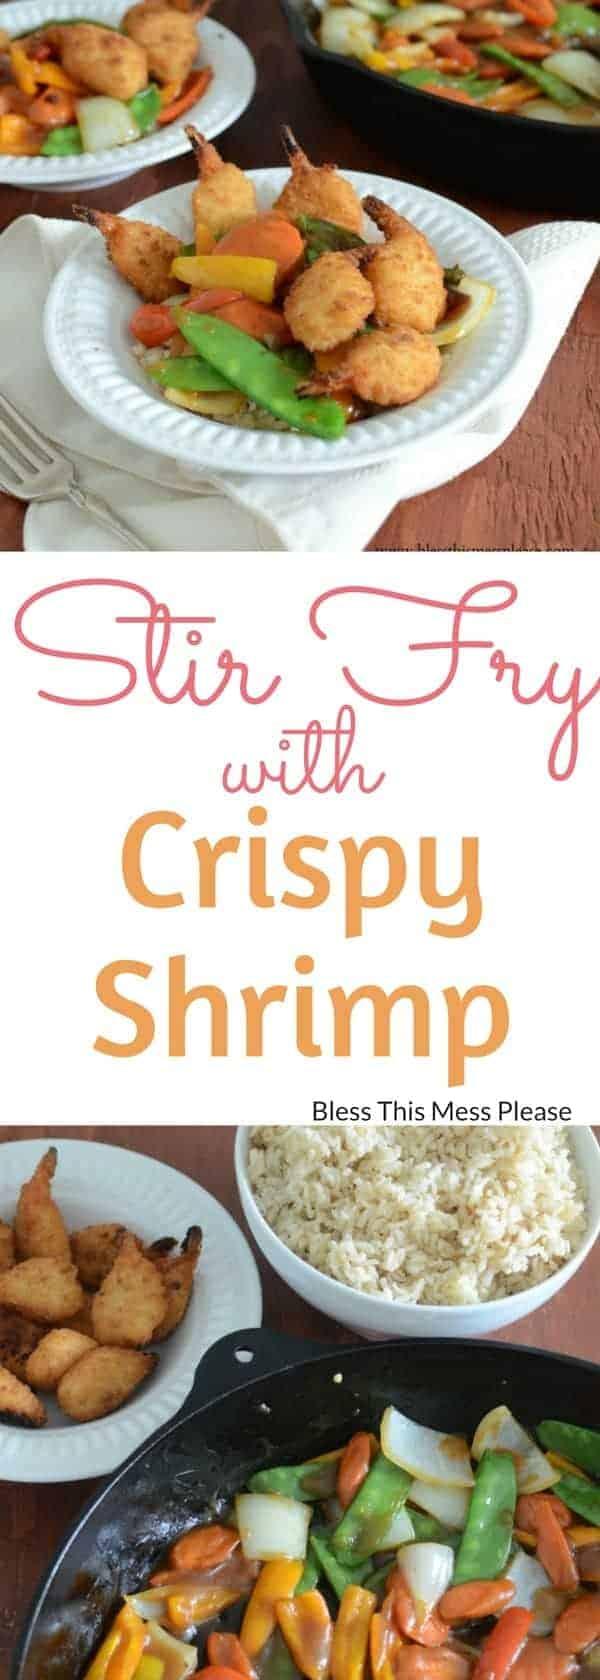 Crispy Shrimp Stir Fry